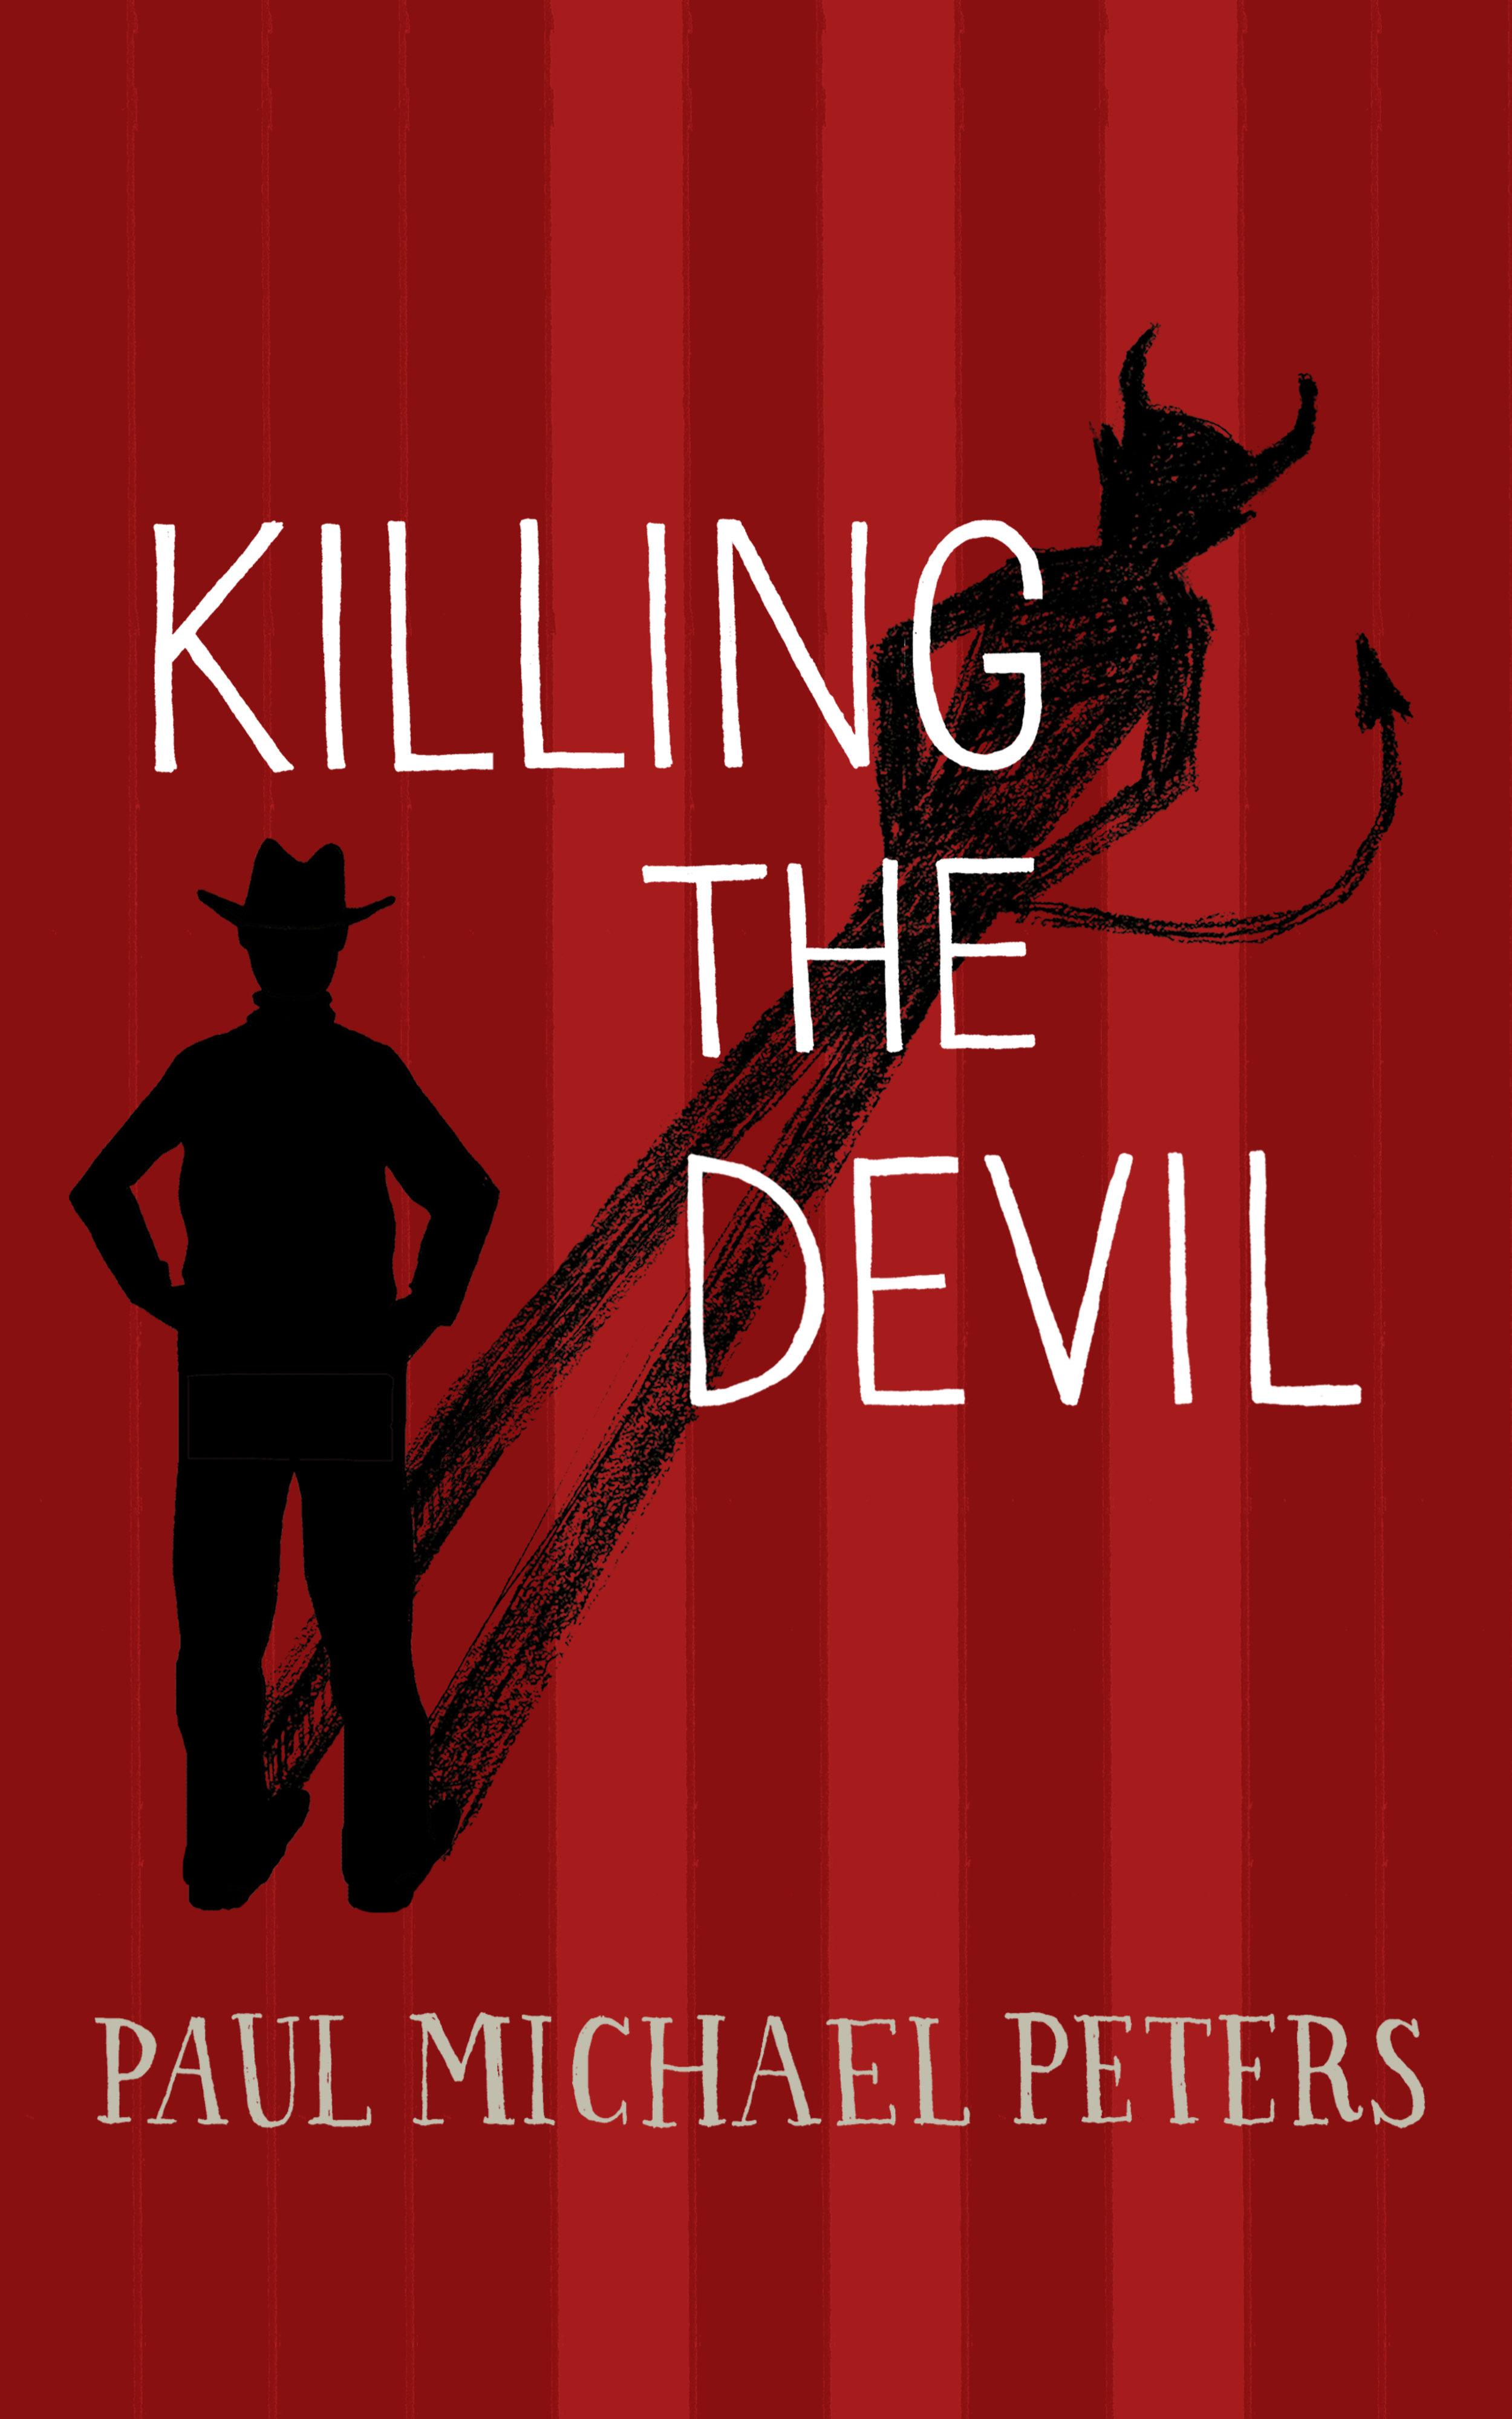 Killing the Devil